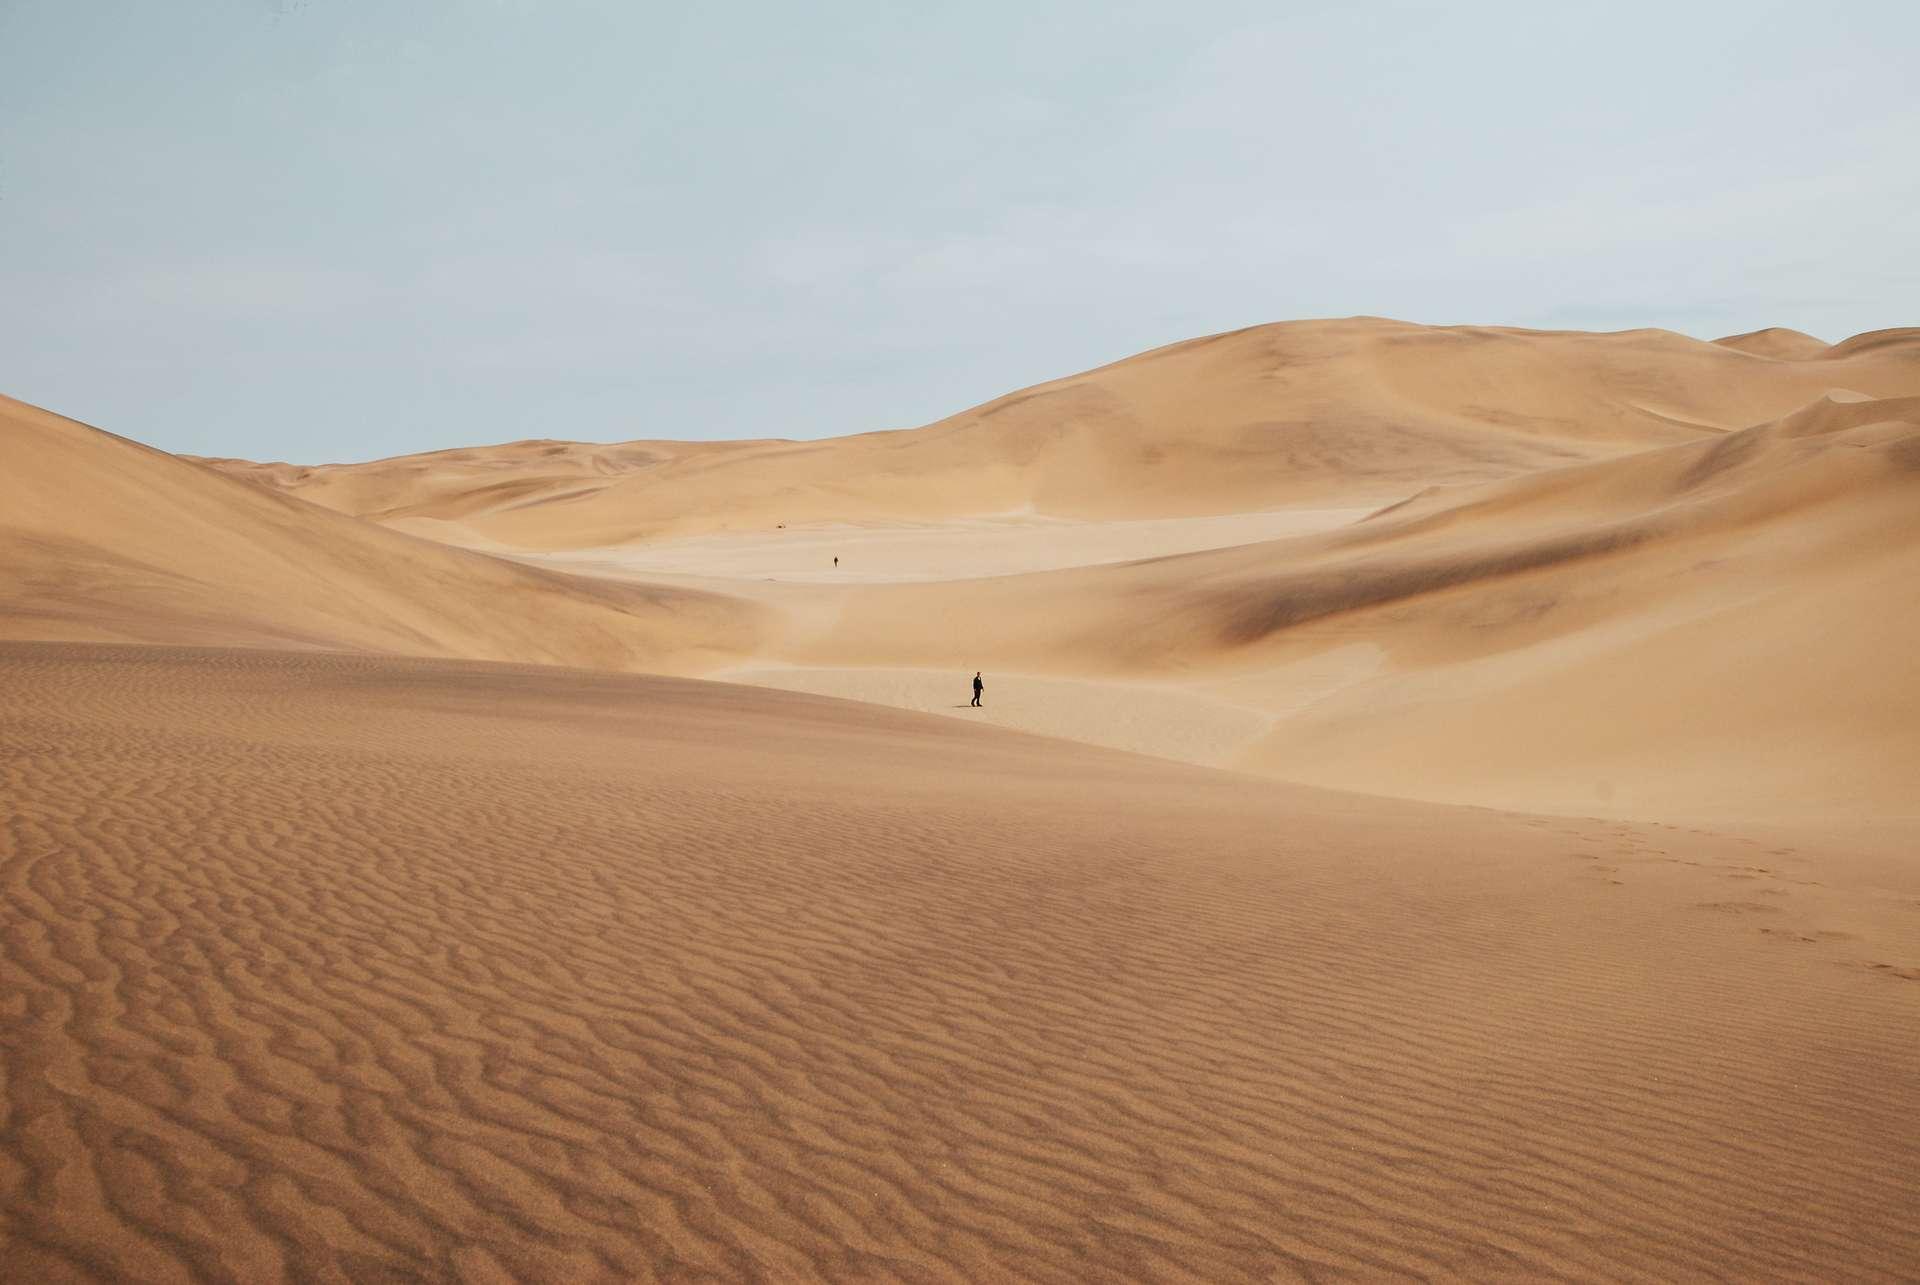 https://cdn.futura-sciences.com/buildsv6/images/largeoriginal/4/b/0/4b05658222_50165186_sable-desert-keith-hardy-unsplash.jpg